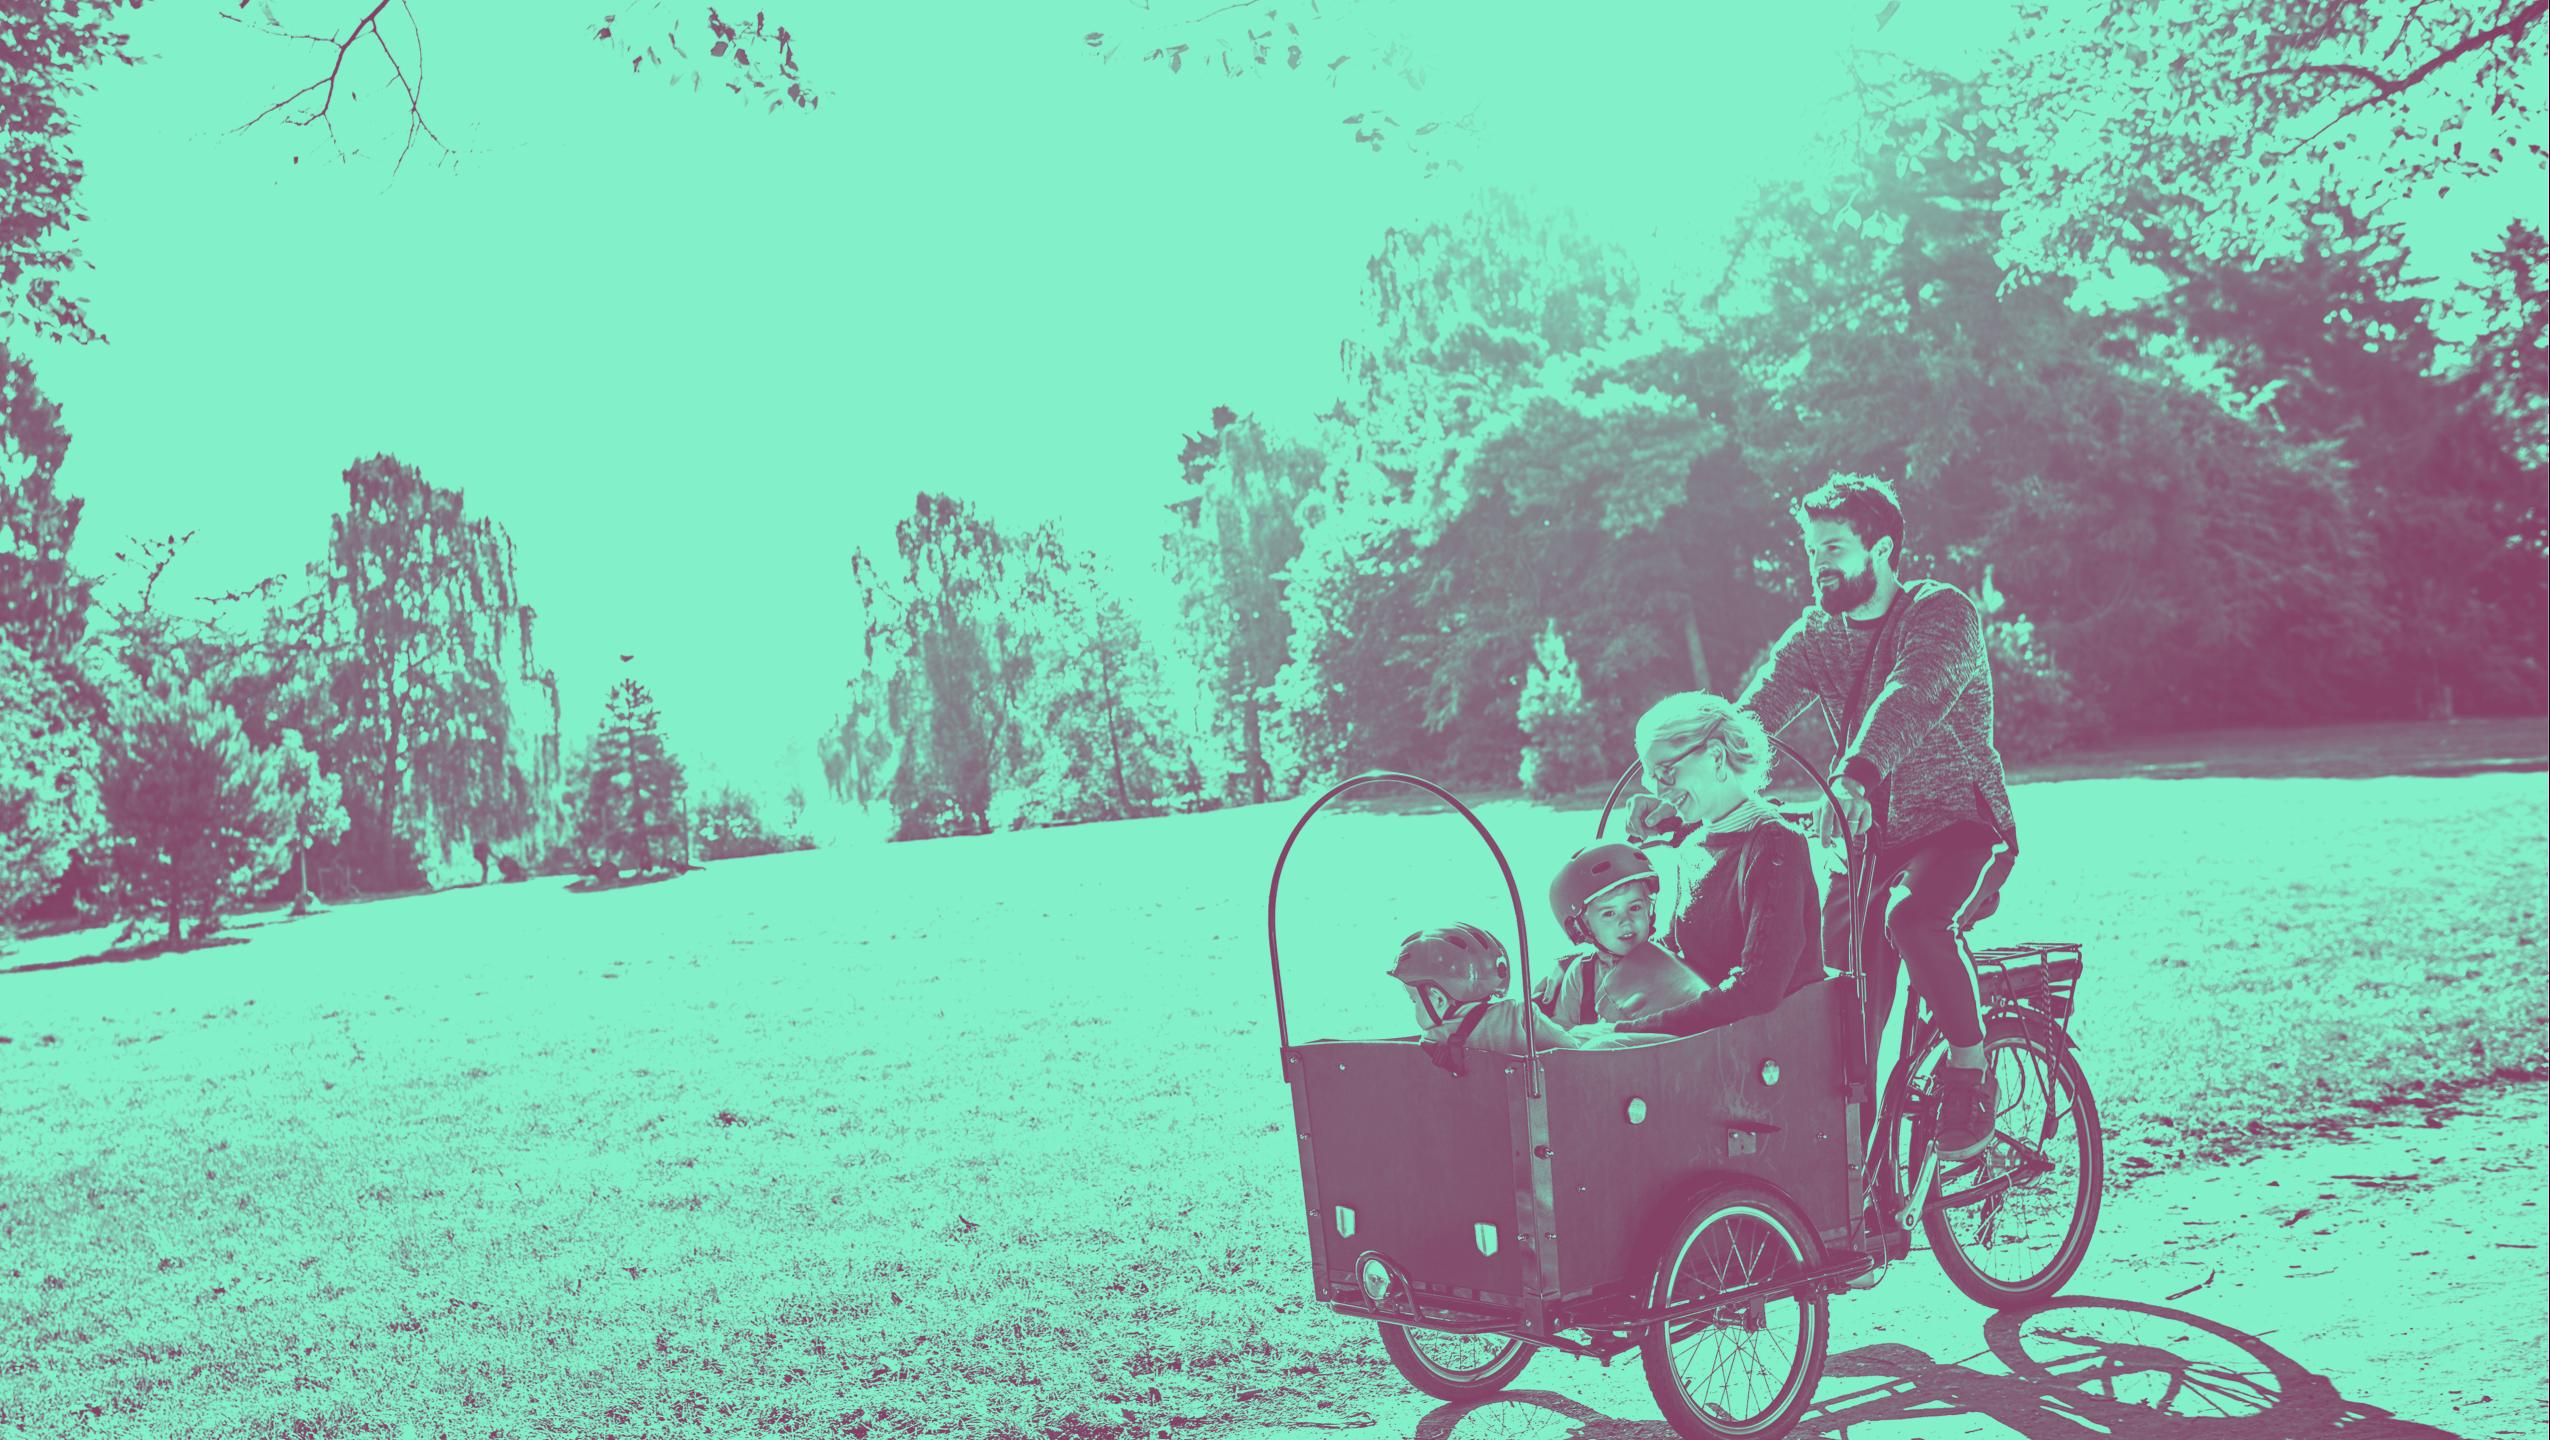 Familie cykellad